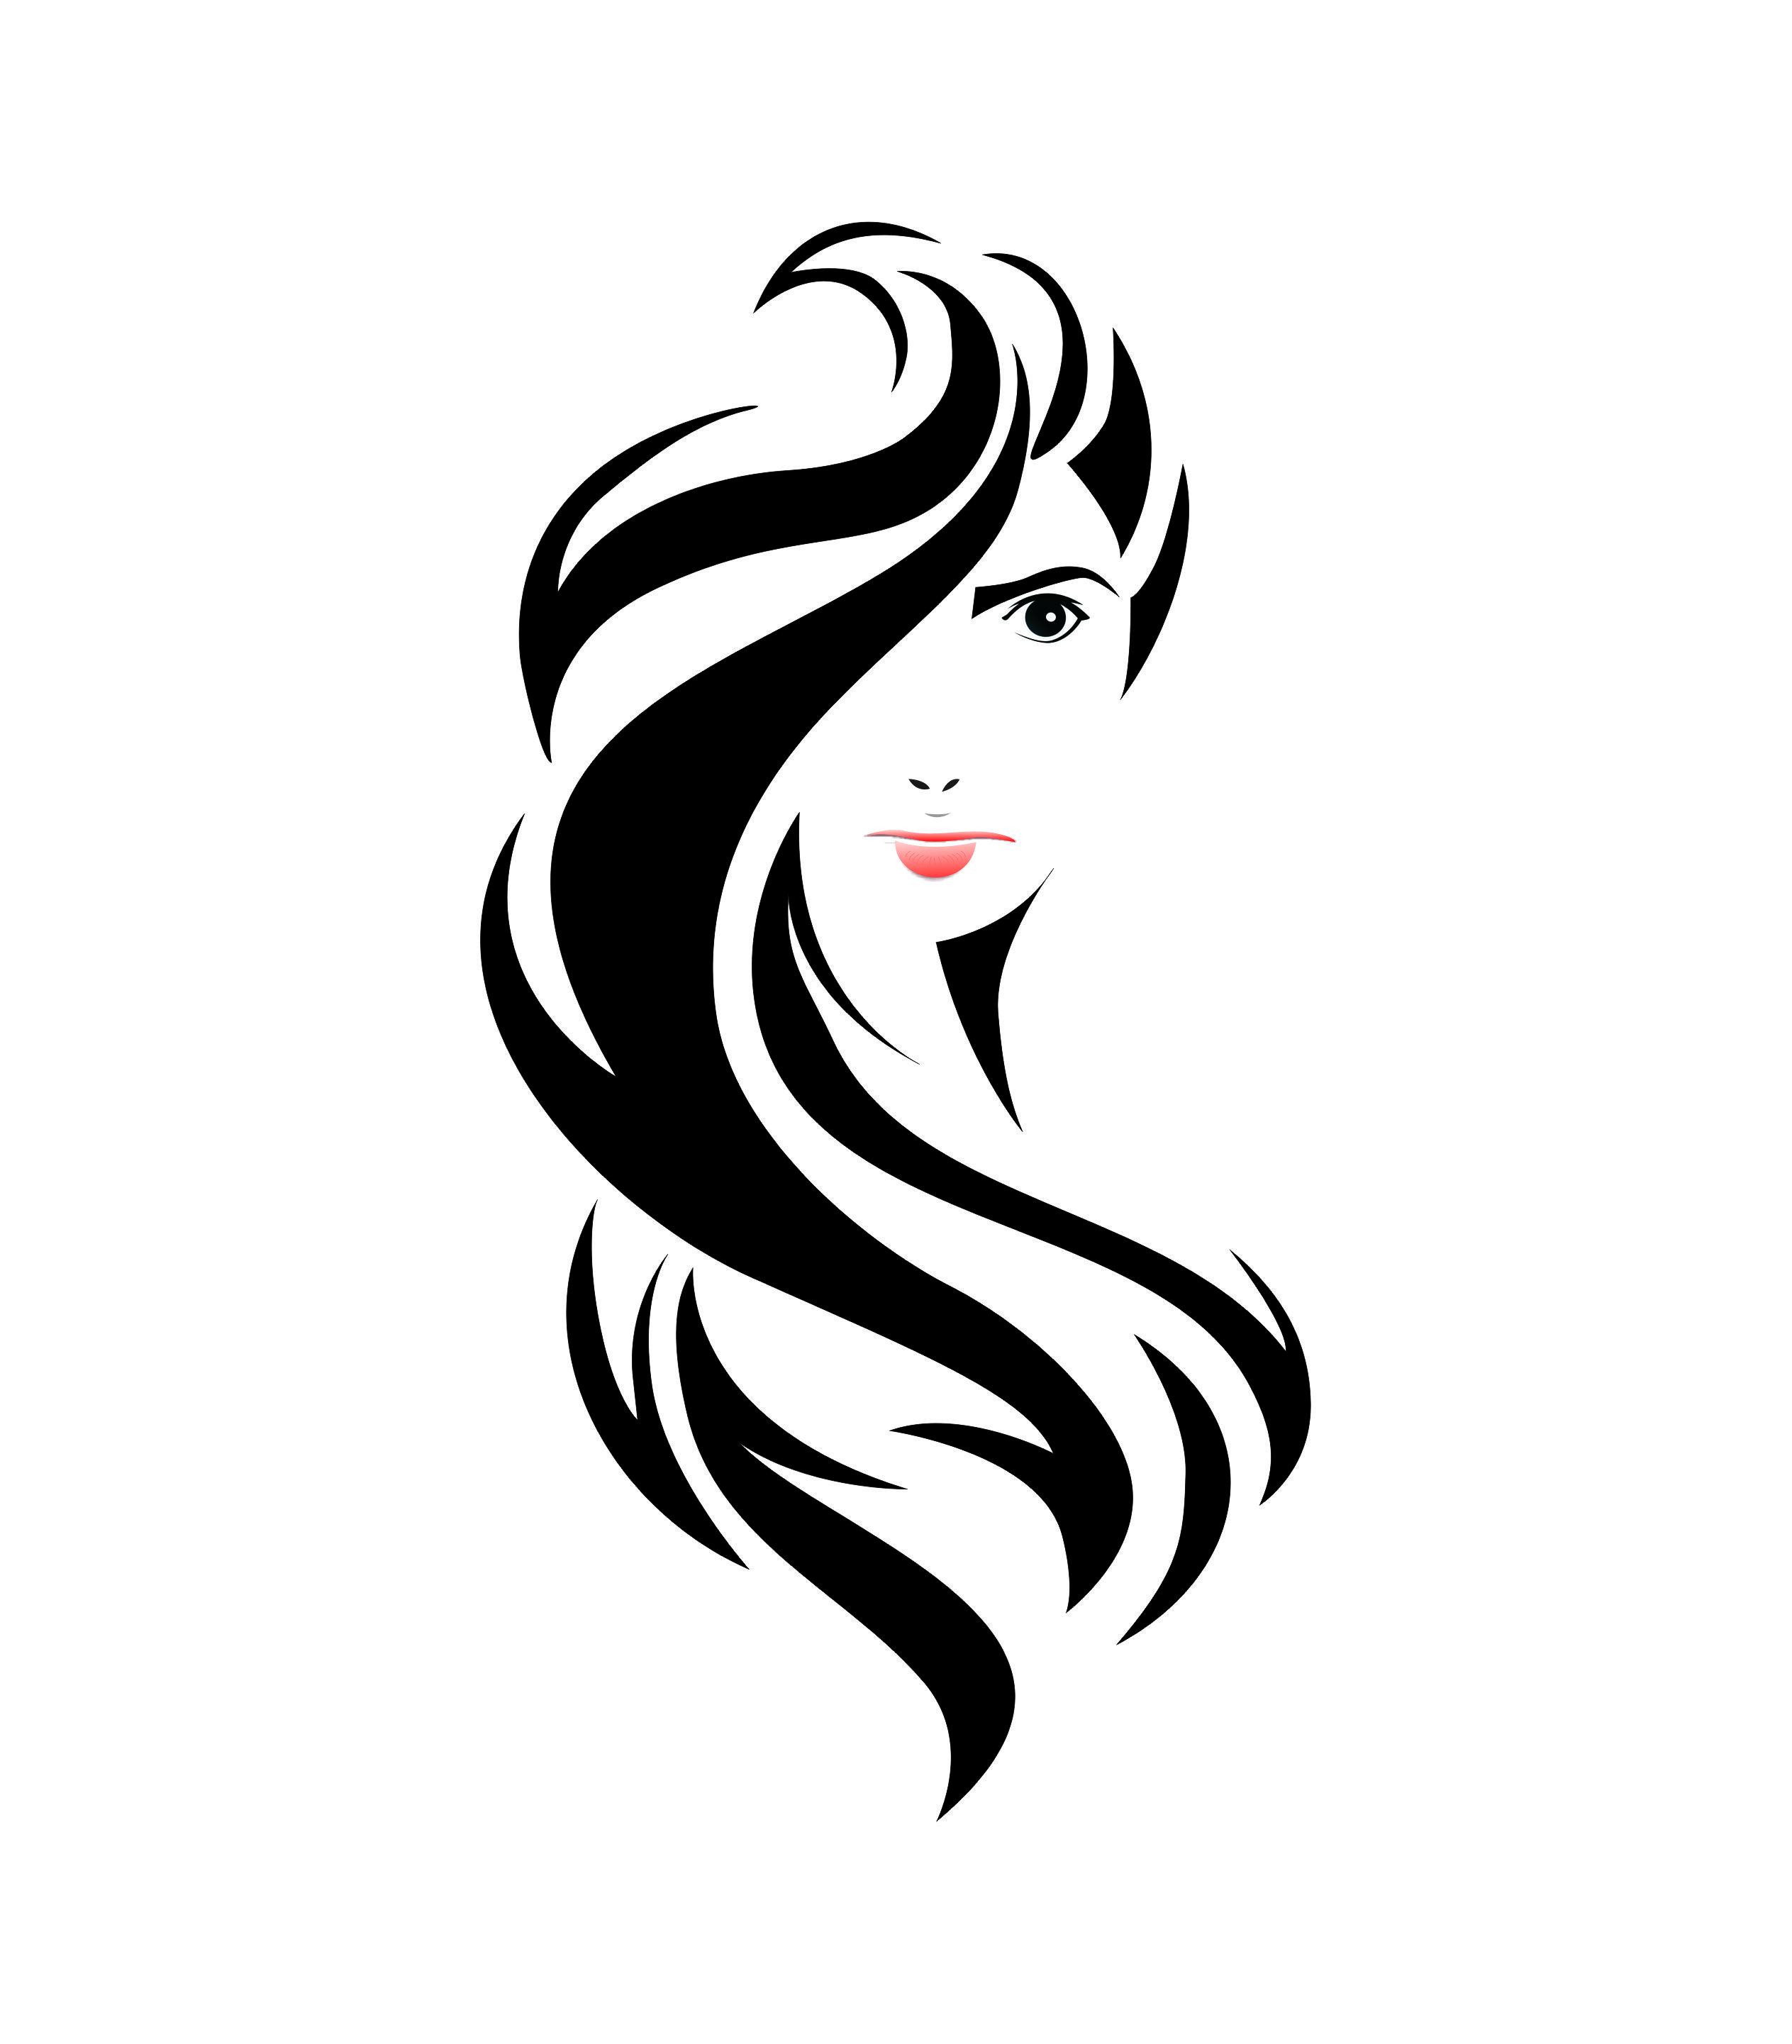 Woman Logo Woman Hair Style Hair Style Clip Art Black And Long Hair Long Hair Designs Amazing Art Womens Hairstyles